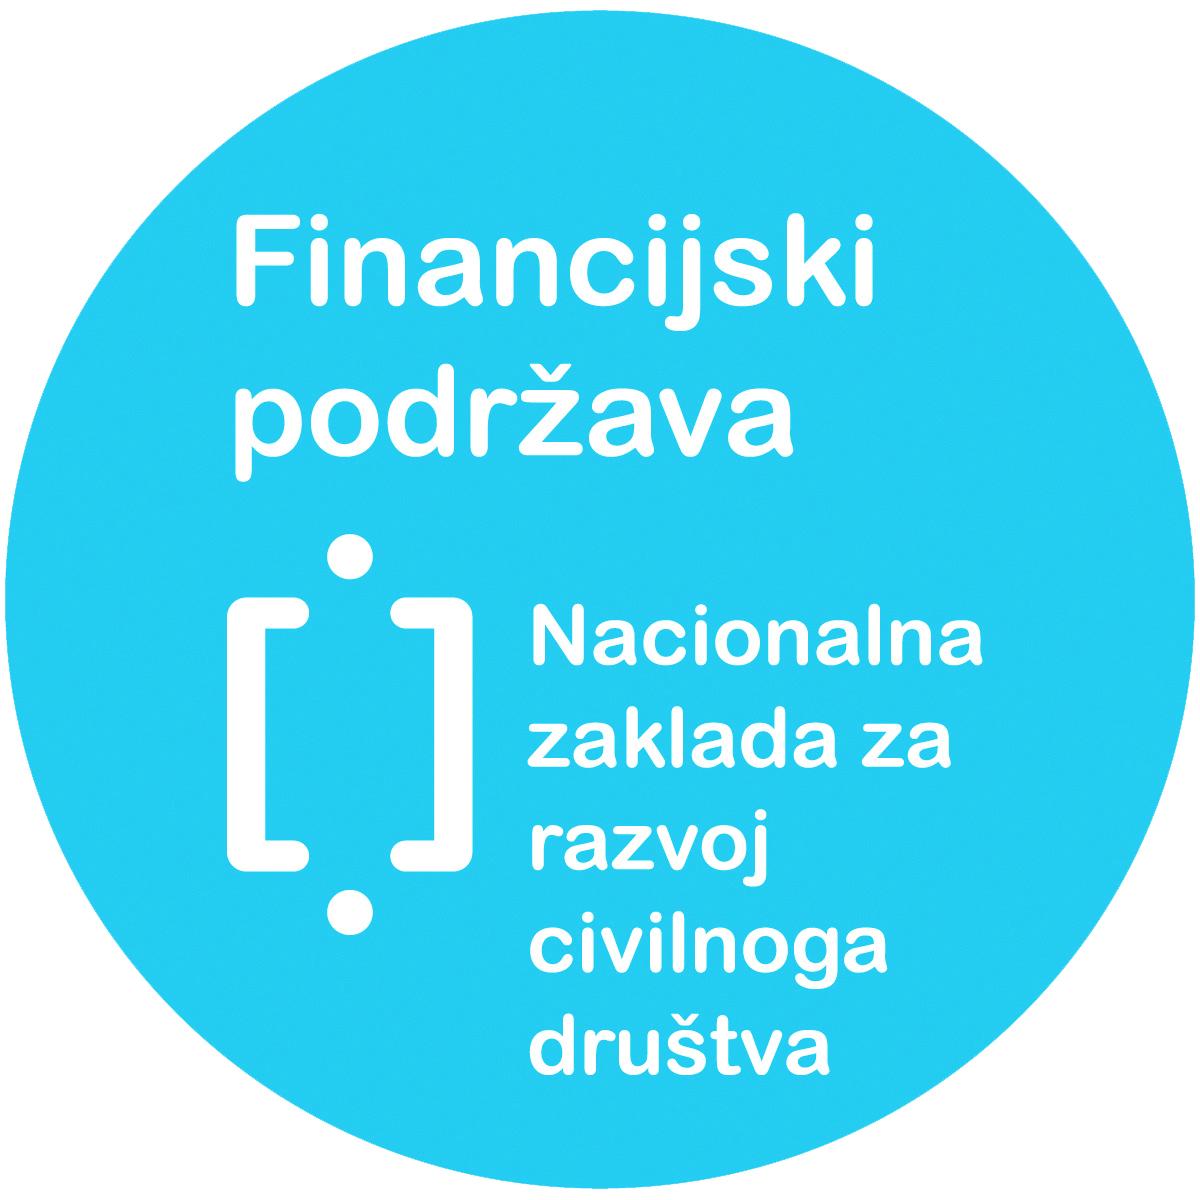 Nacionalna zaklada za razvoj civilnog društva logo